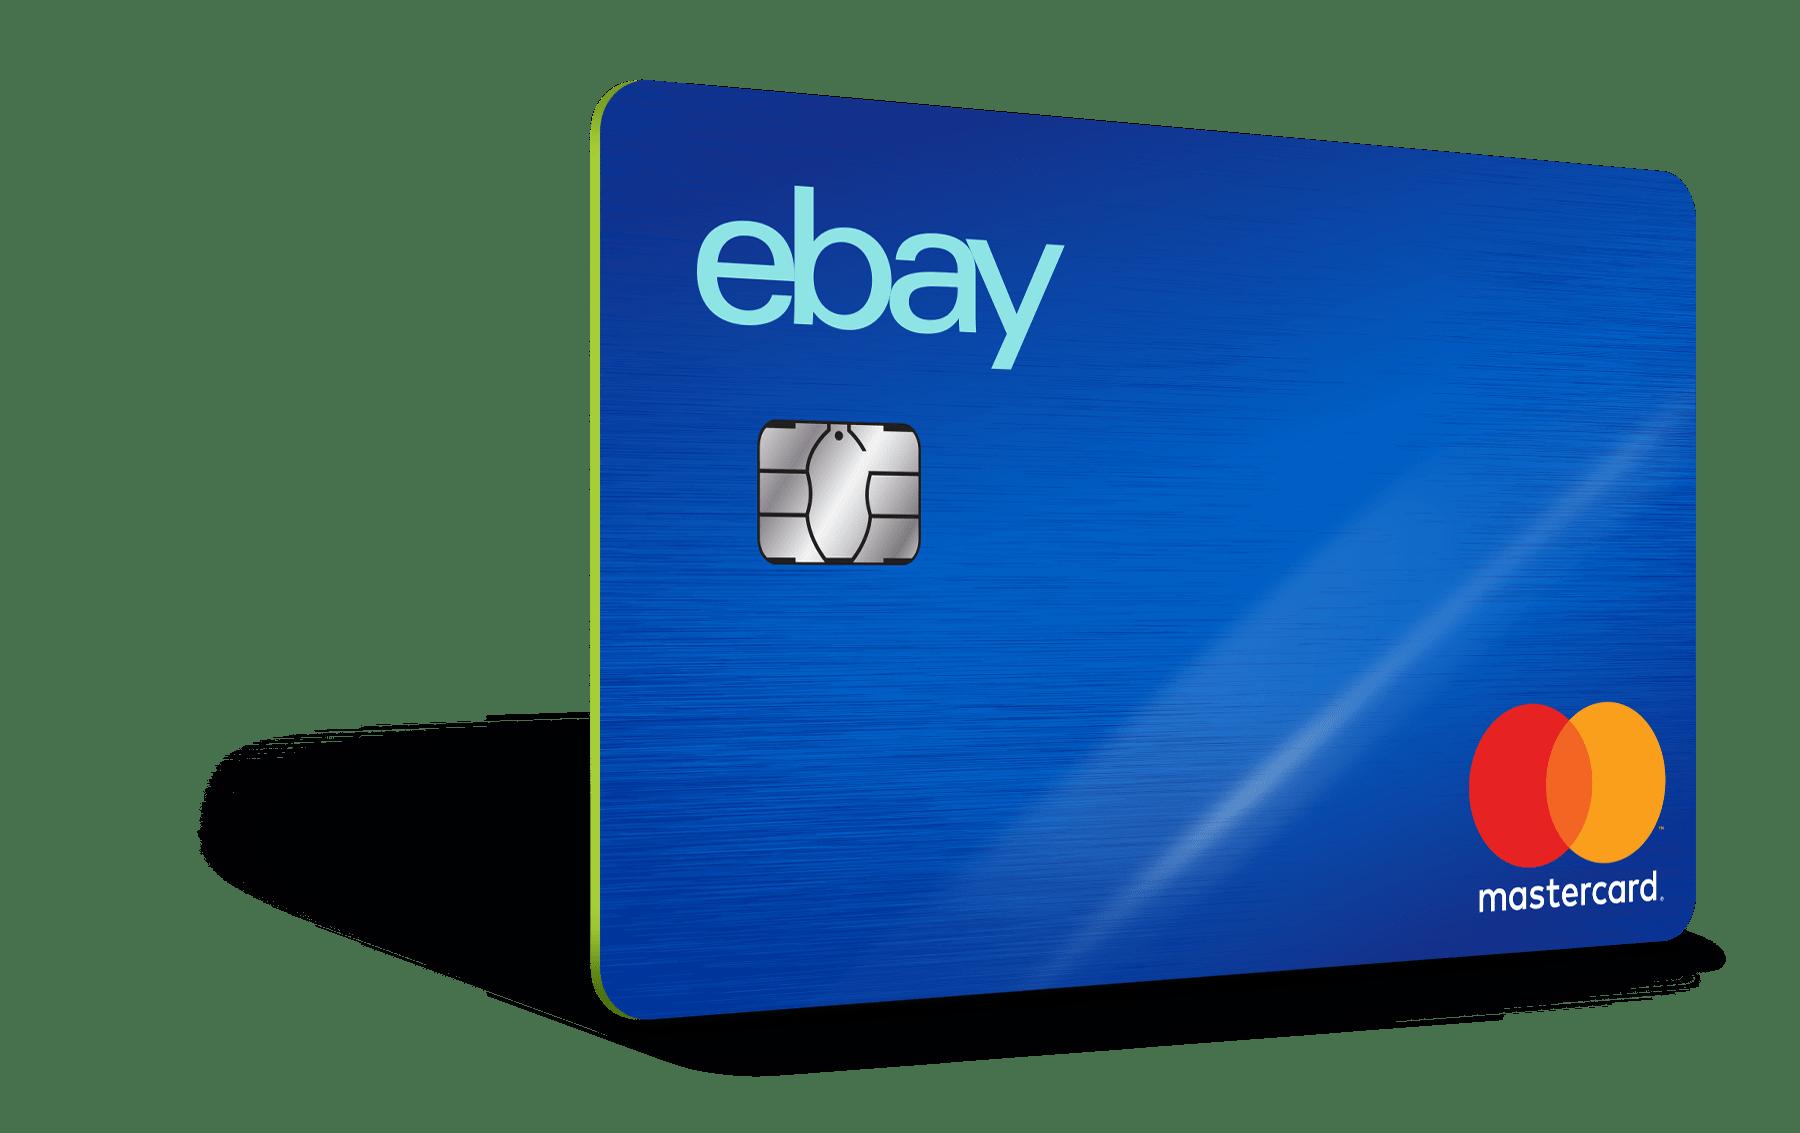 eBay Mastercard Free credit card, Credit card numbers, Credit